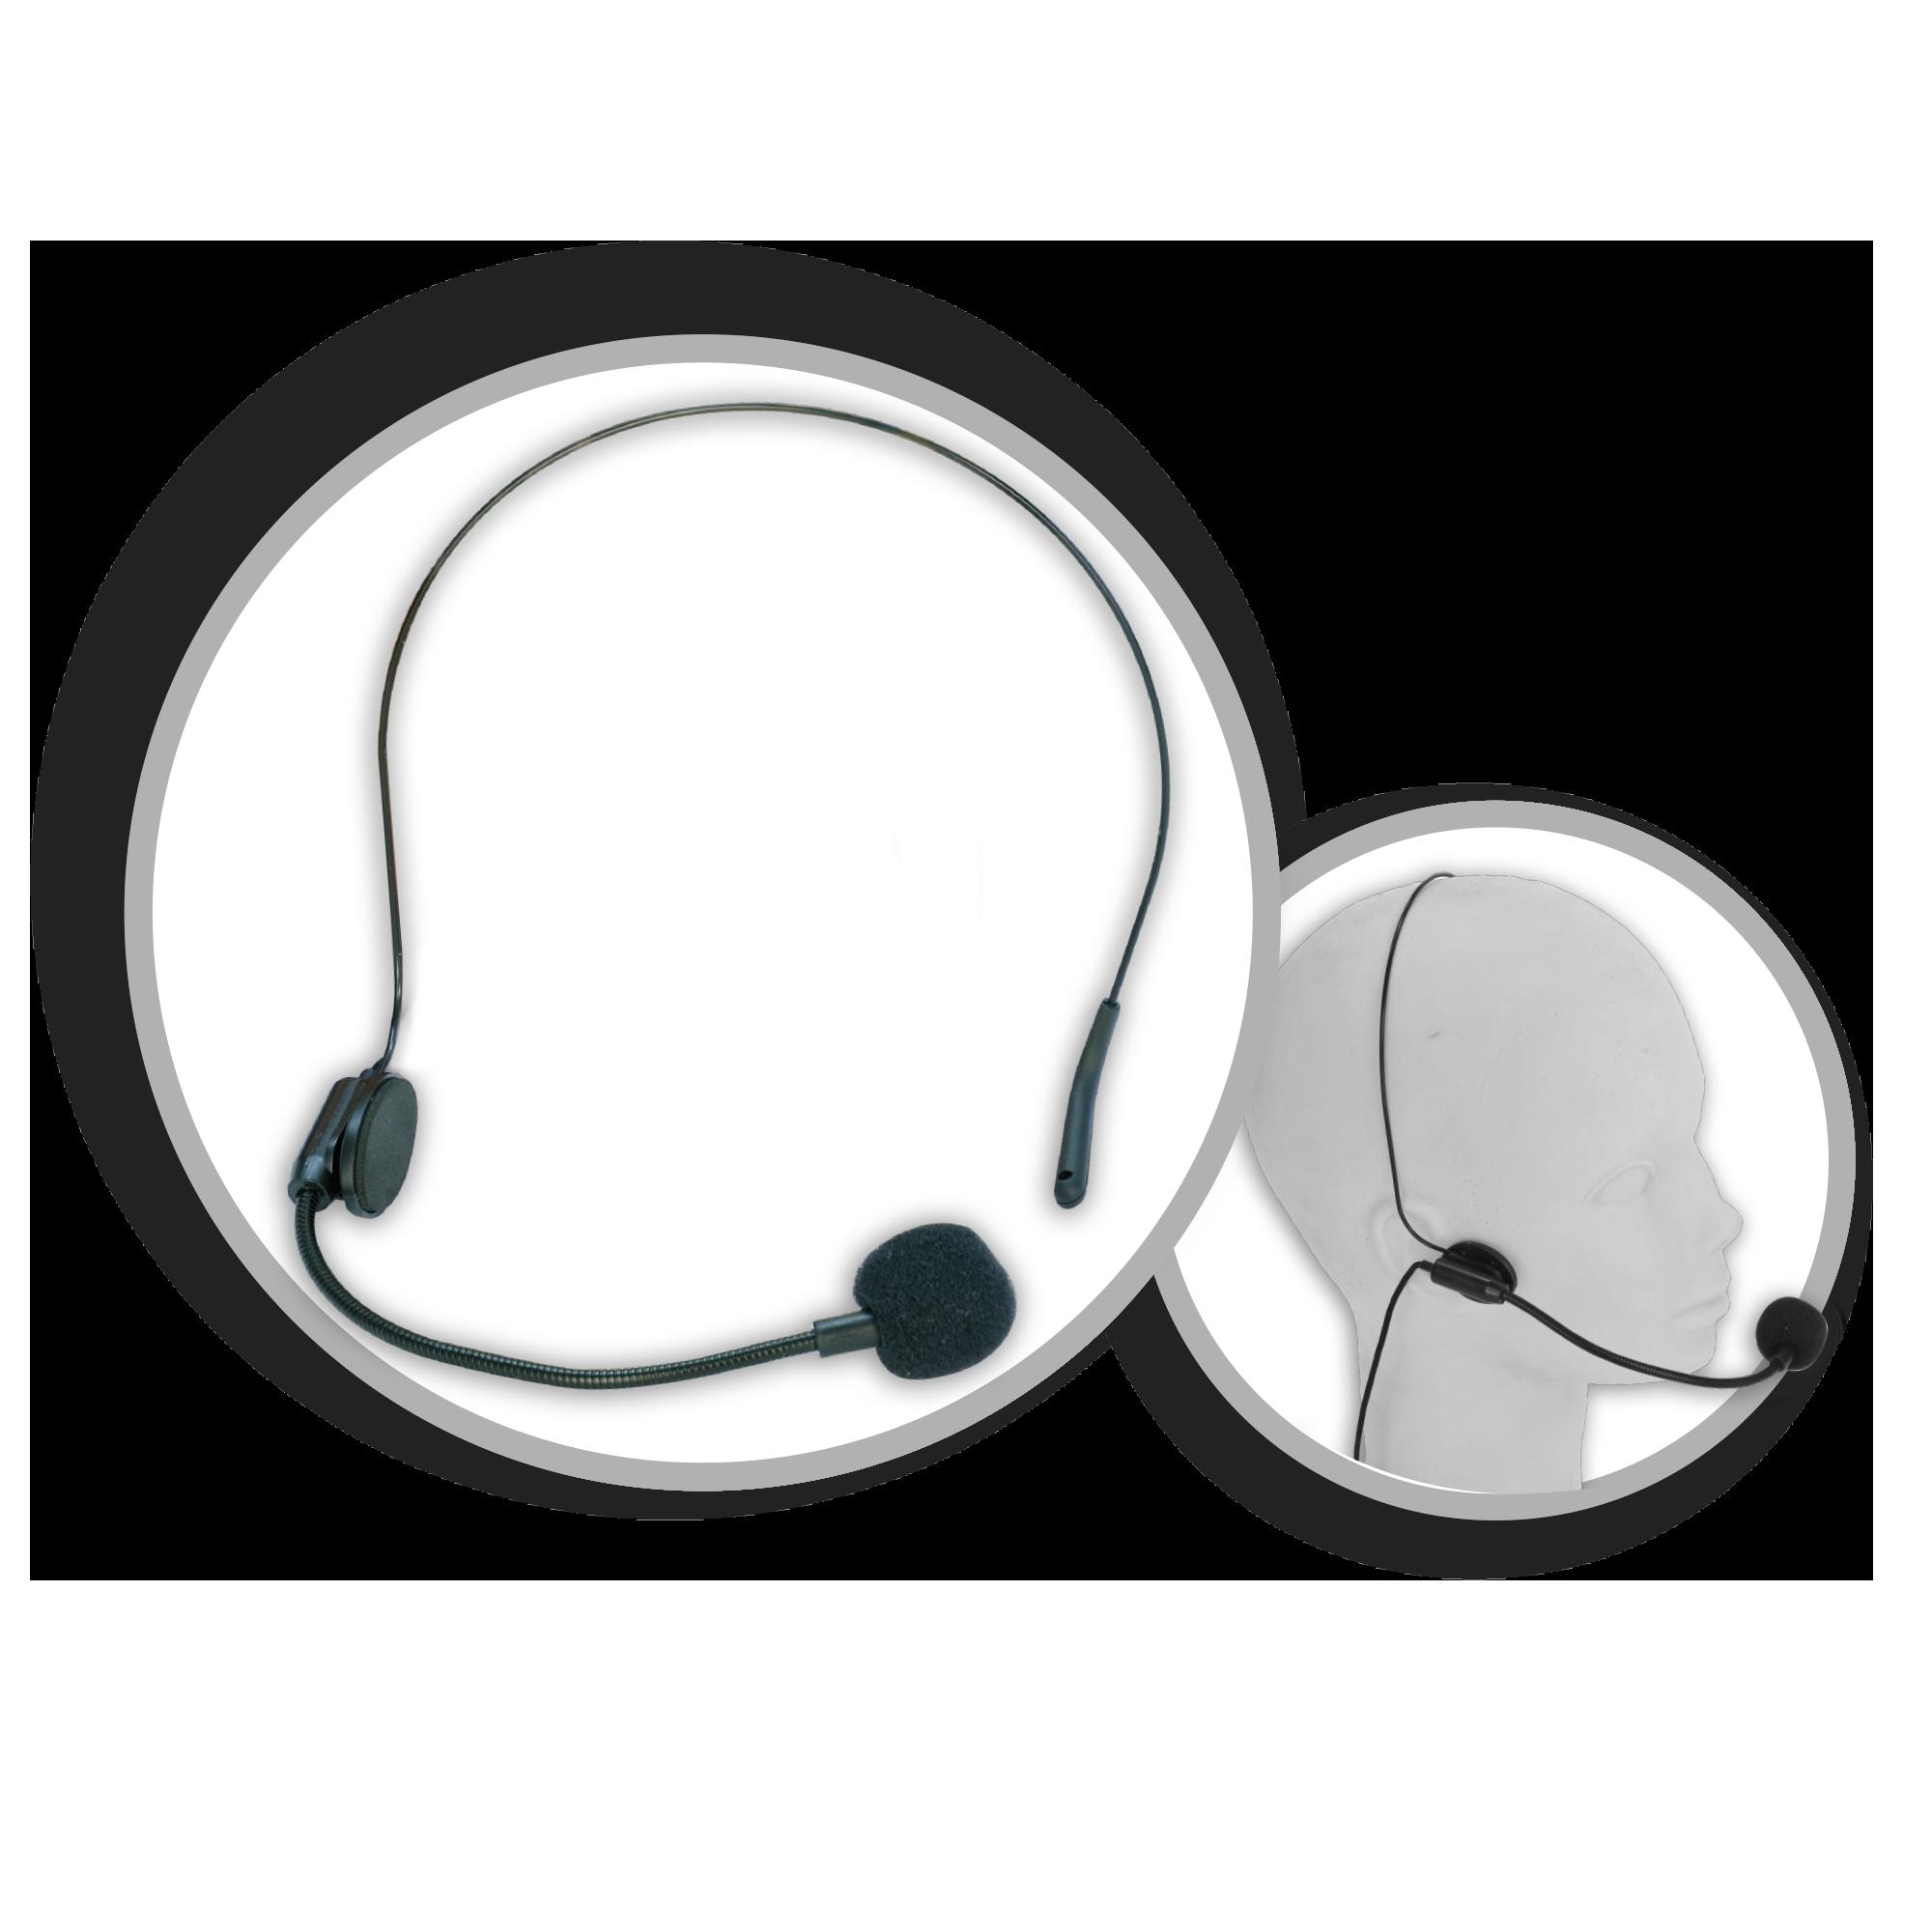 Chitarra rock wireless - MUSIC STAR